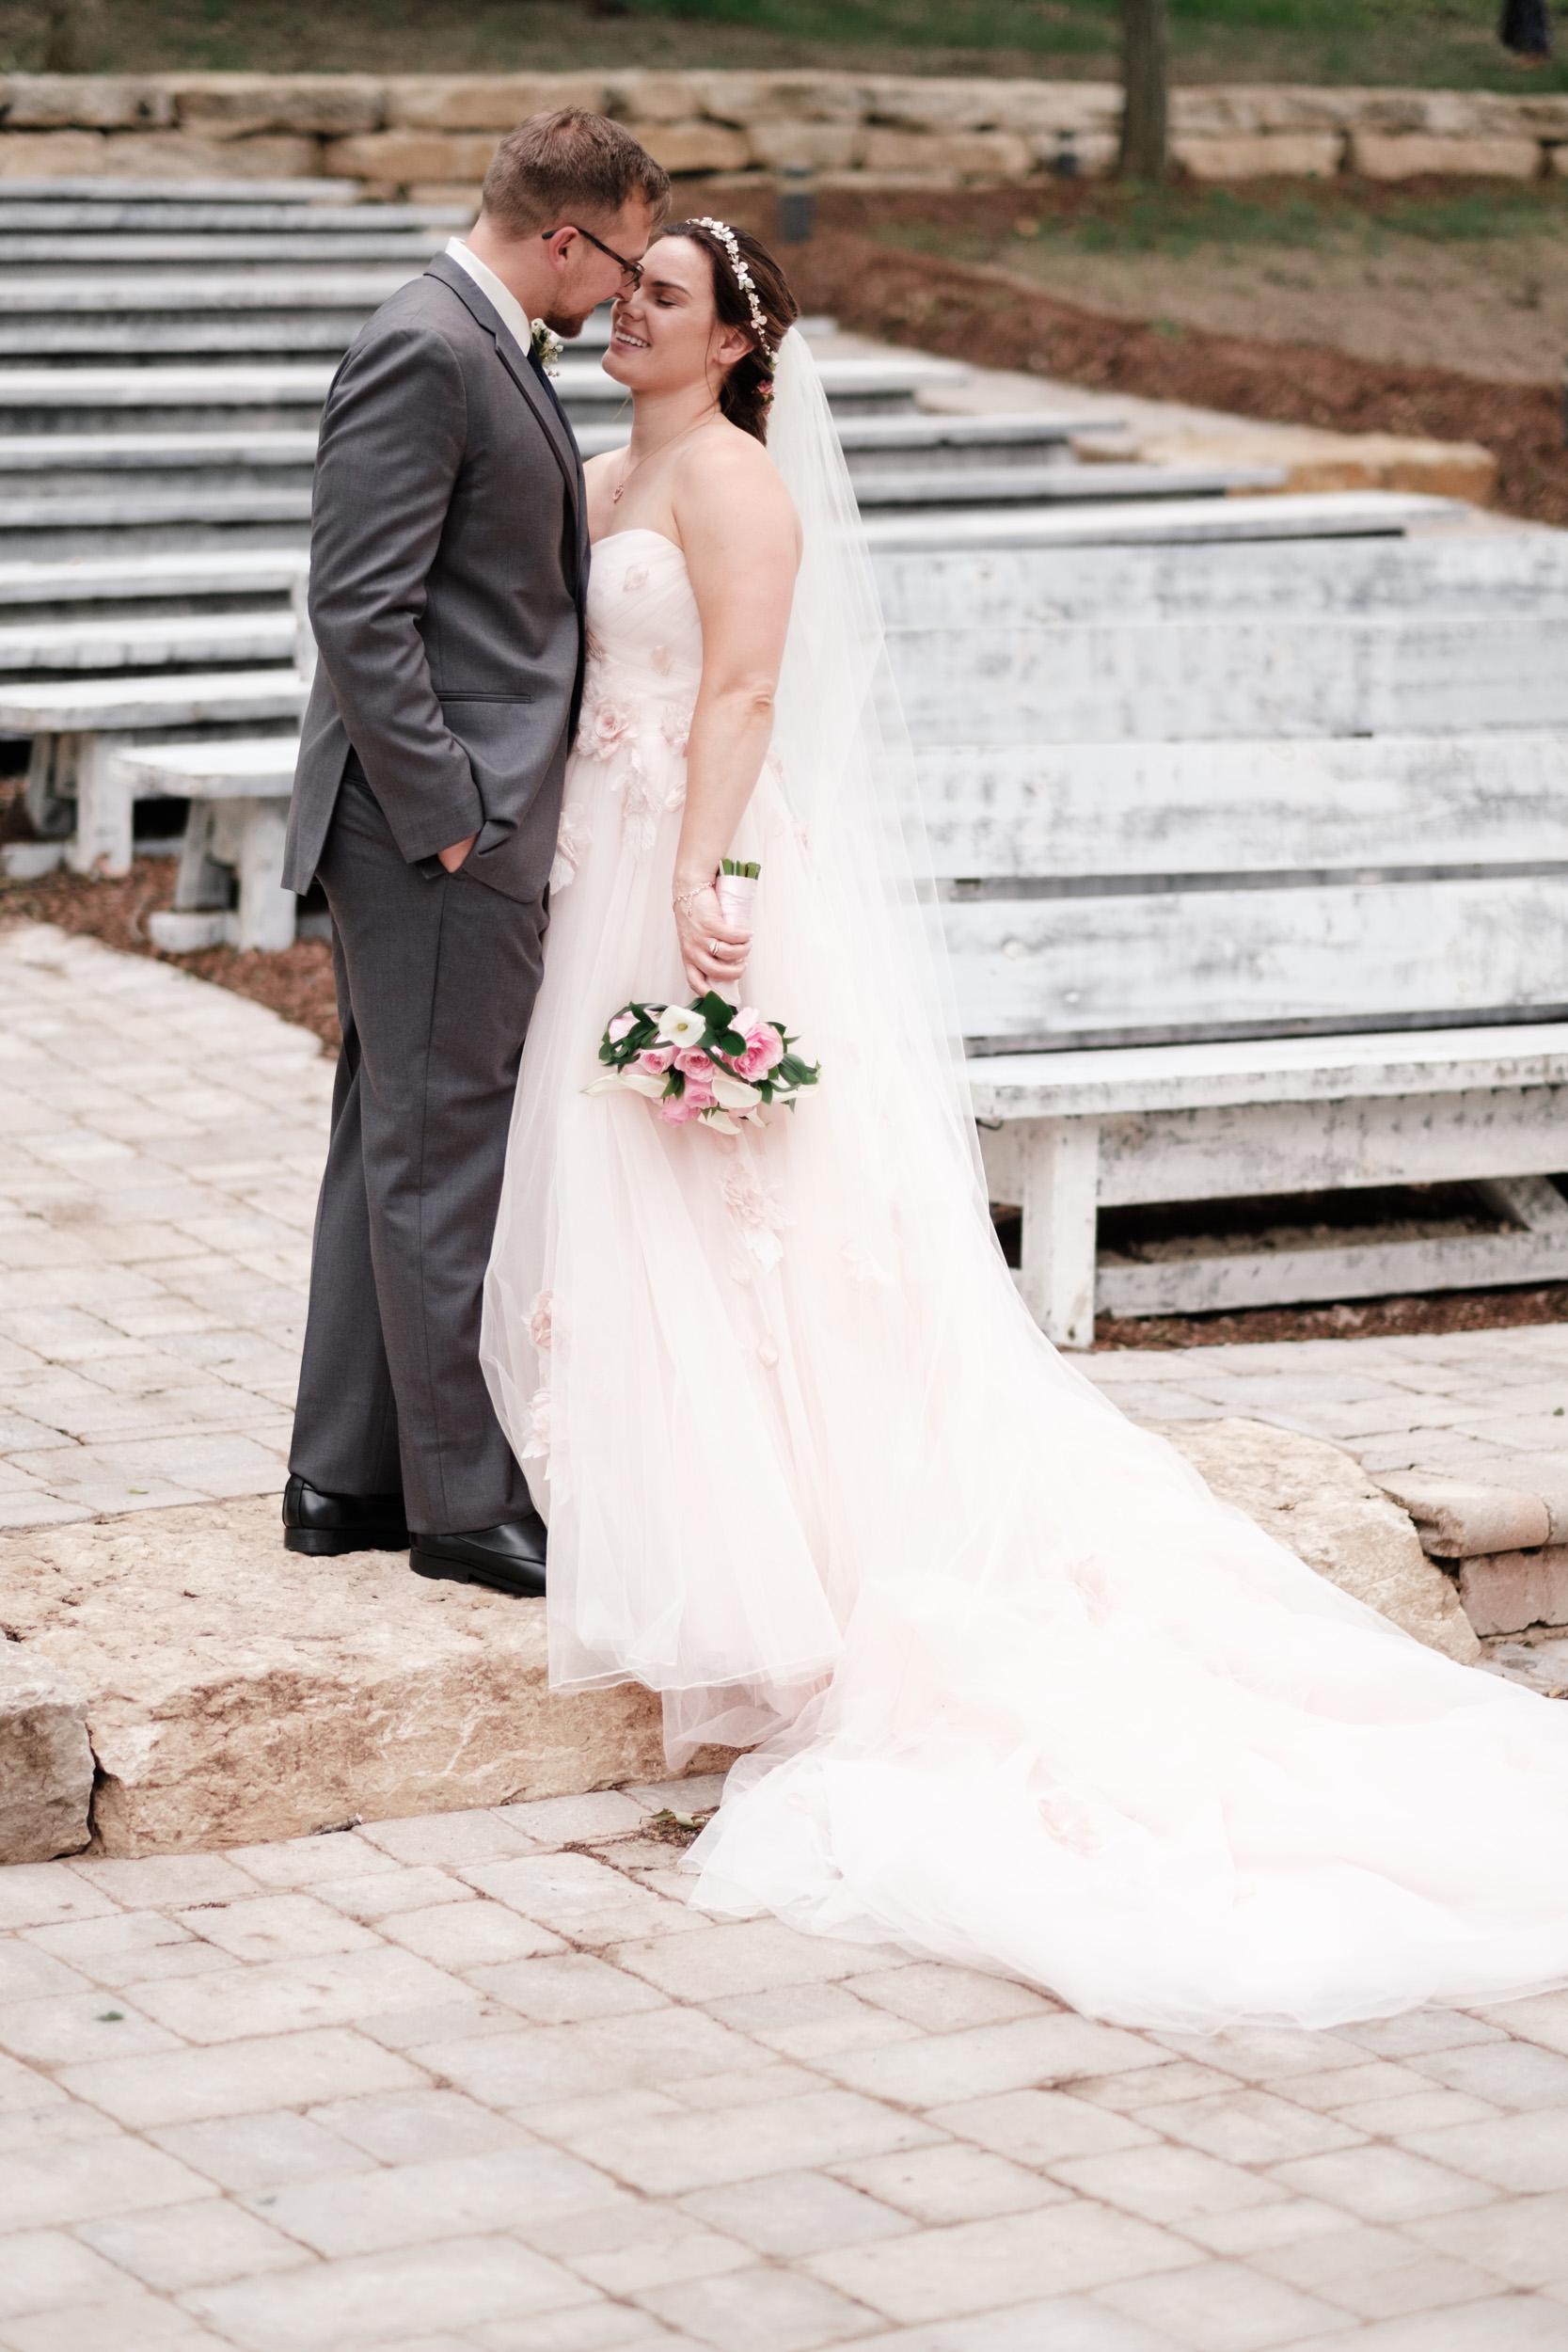 19-06-22-Ryan-Katie-The-Fields-Reserve-Wedding-47.jpg